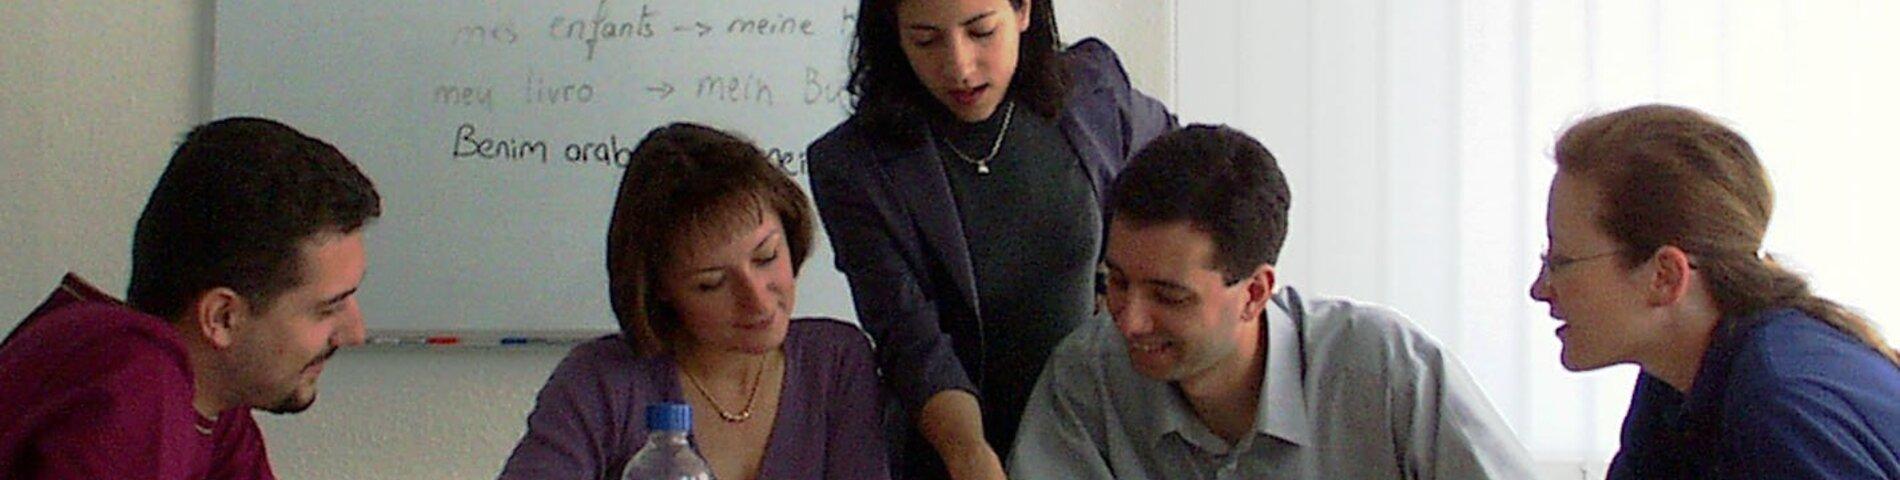 FOKUS Sprachen & Seminare  afbeelding 1